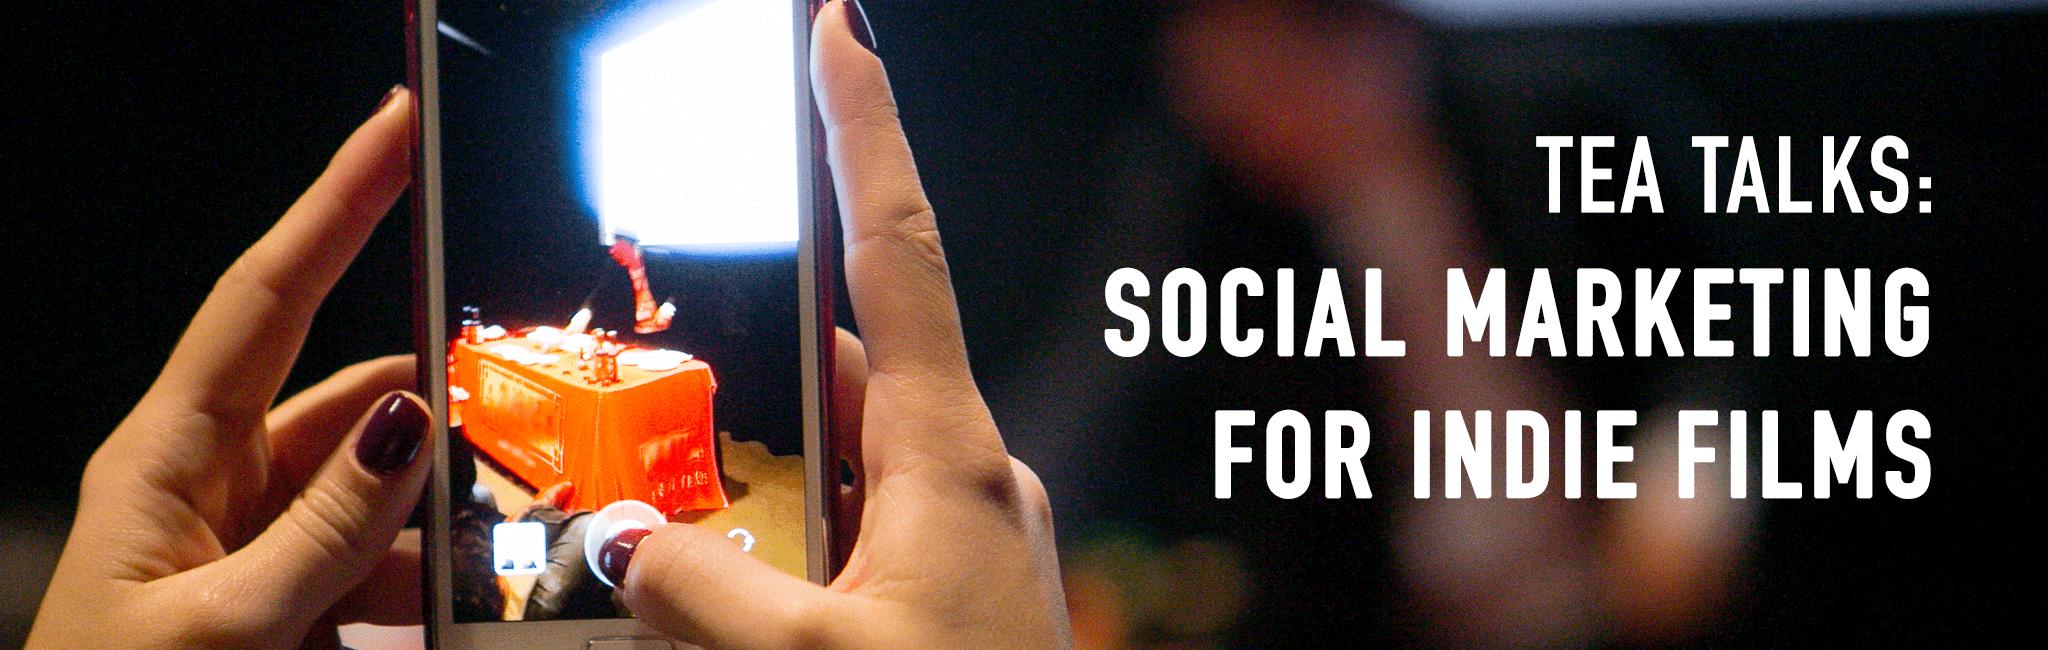 Tea Talks: Social Marketing for Indie Films